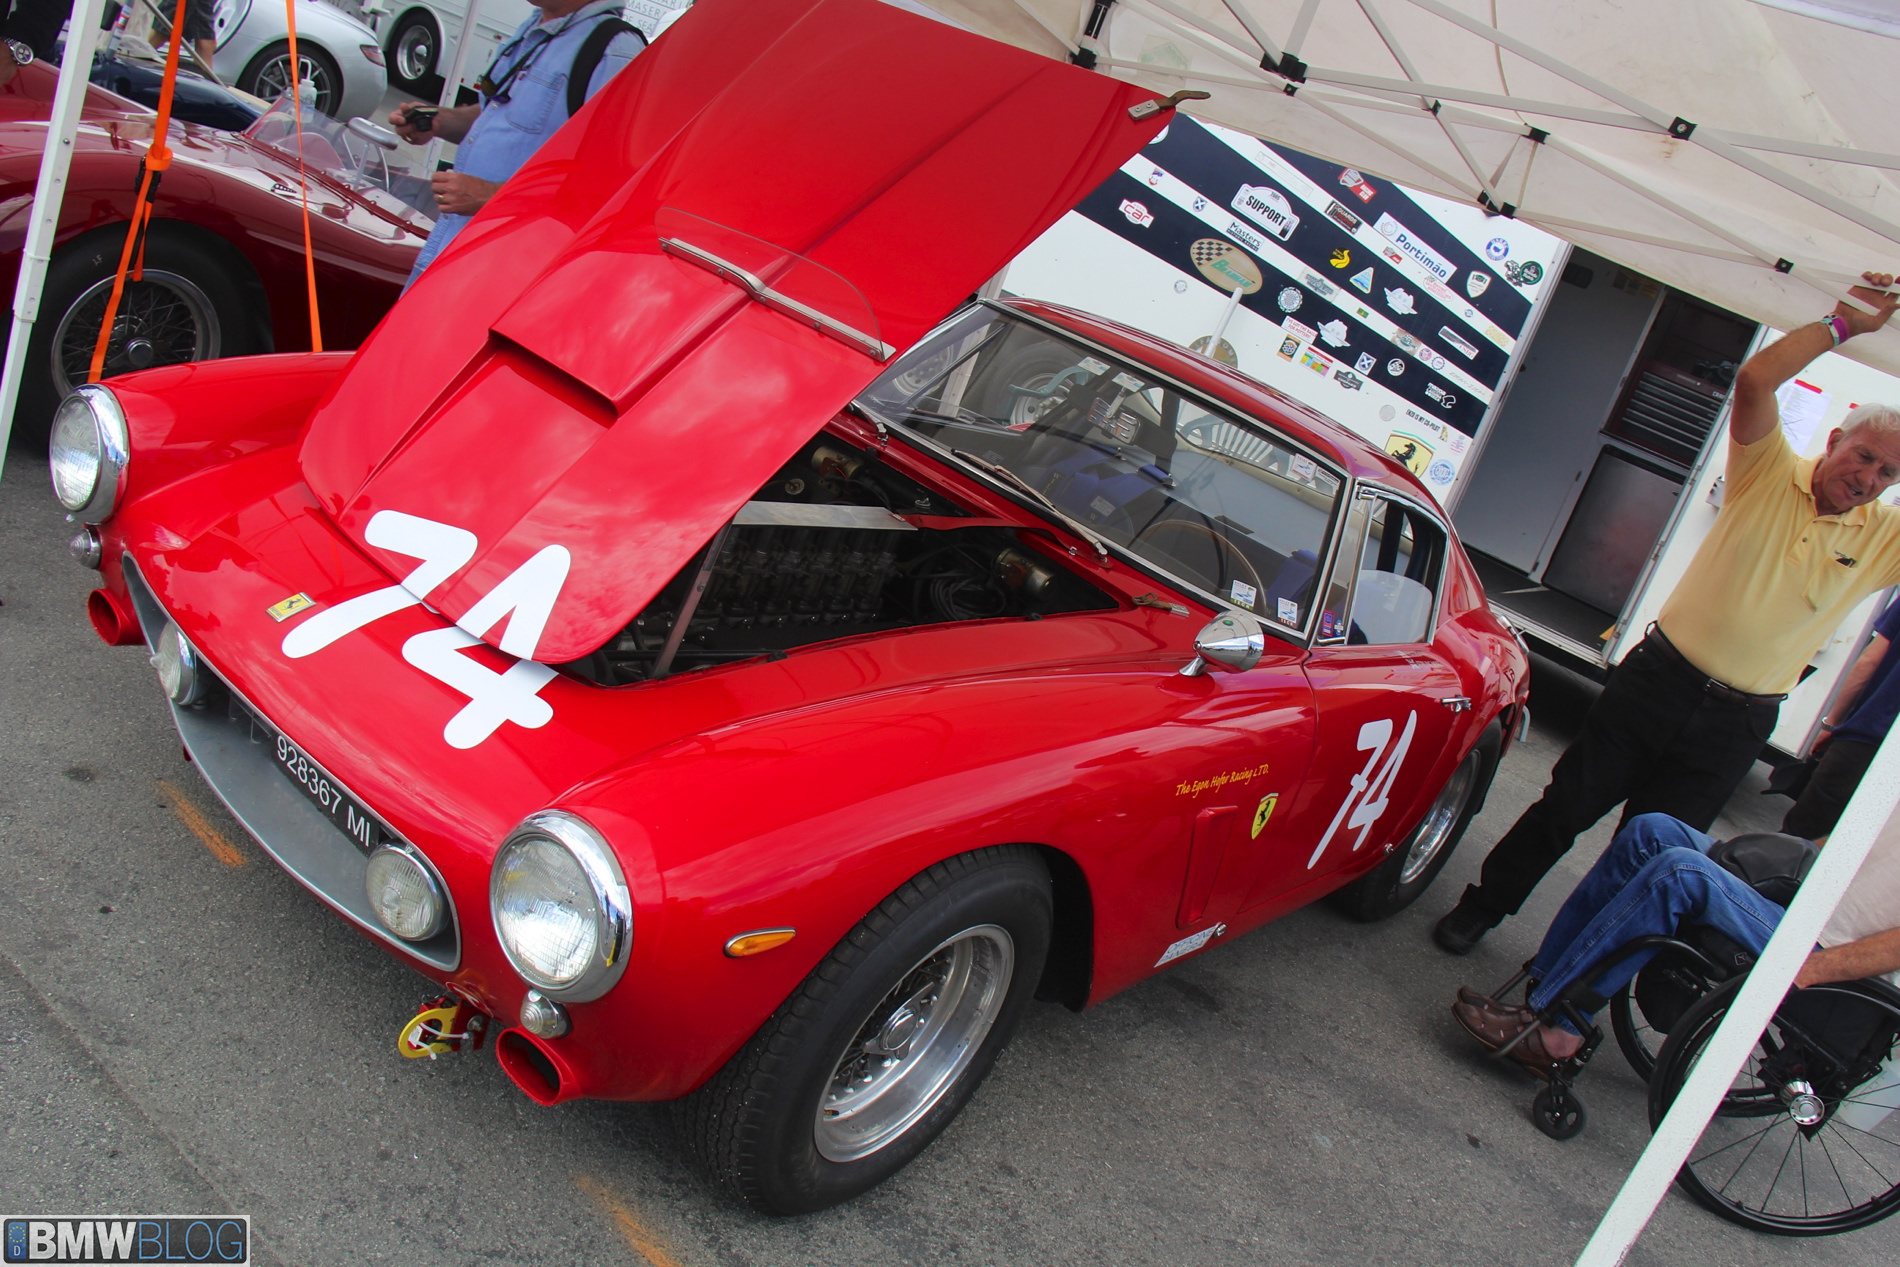 Rolex Motorsports Reunion Bmw S Racing Heritage On Track